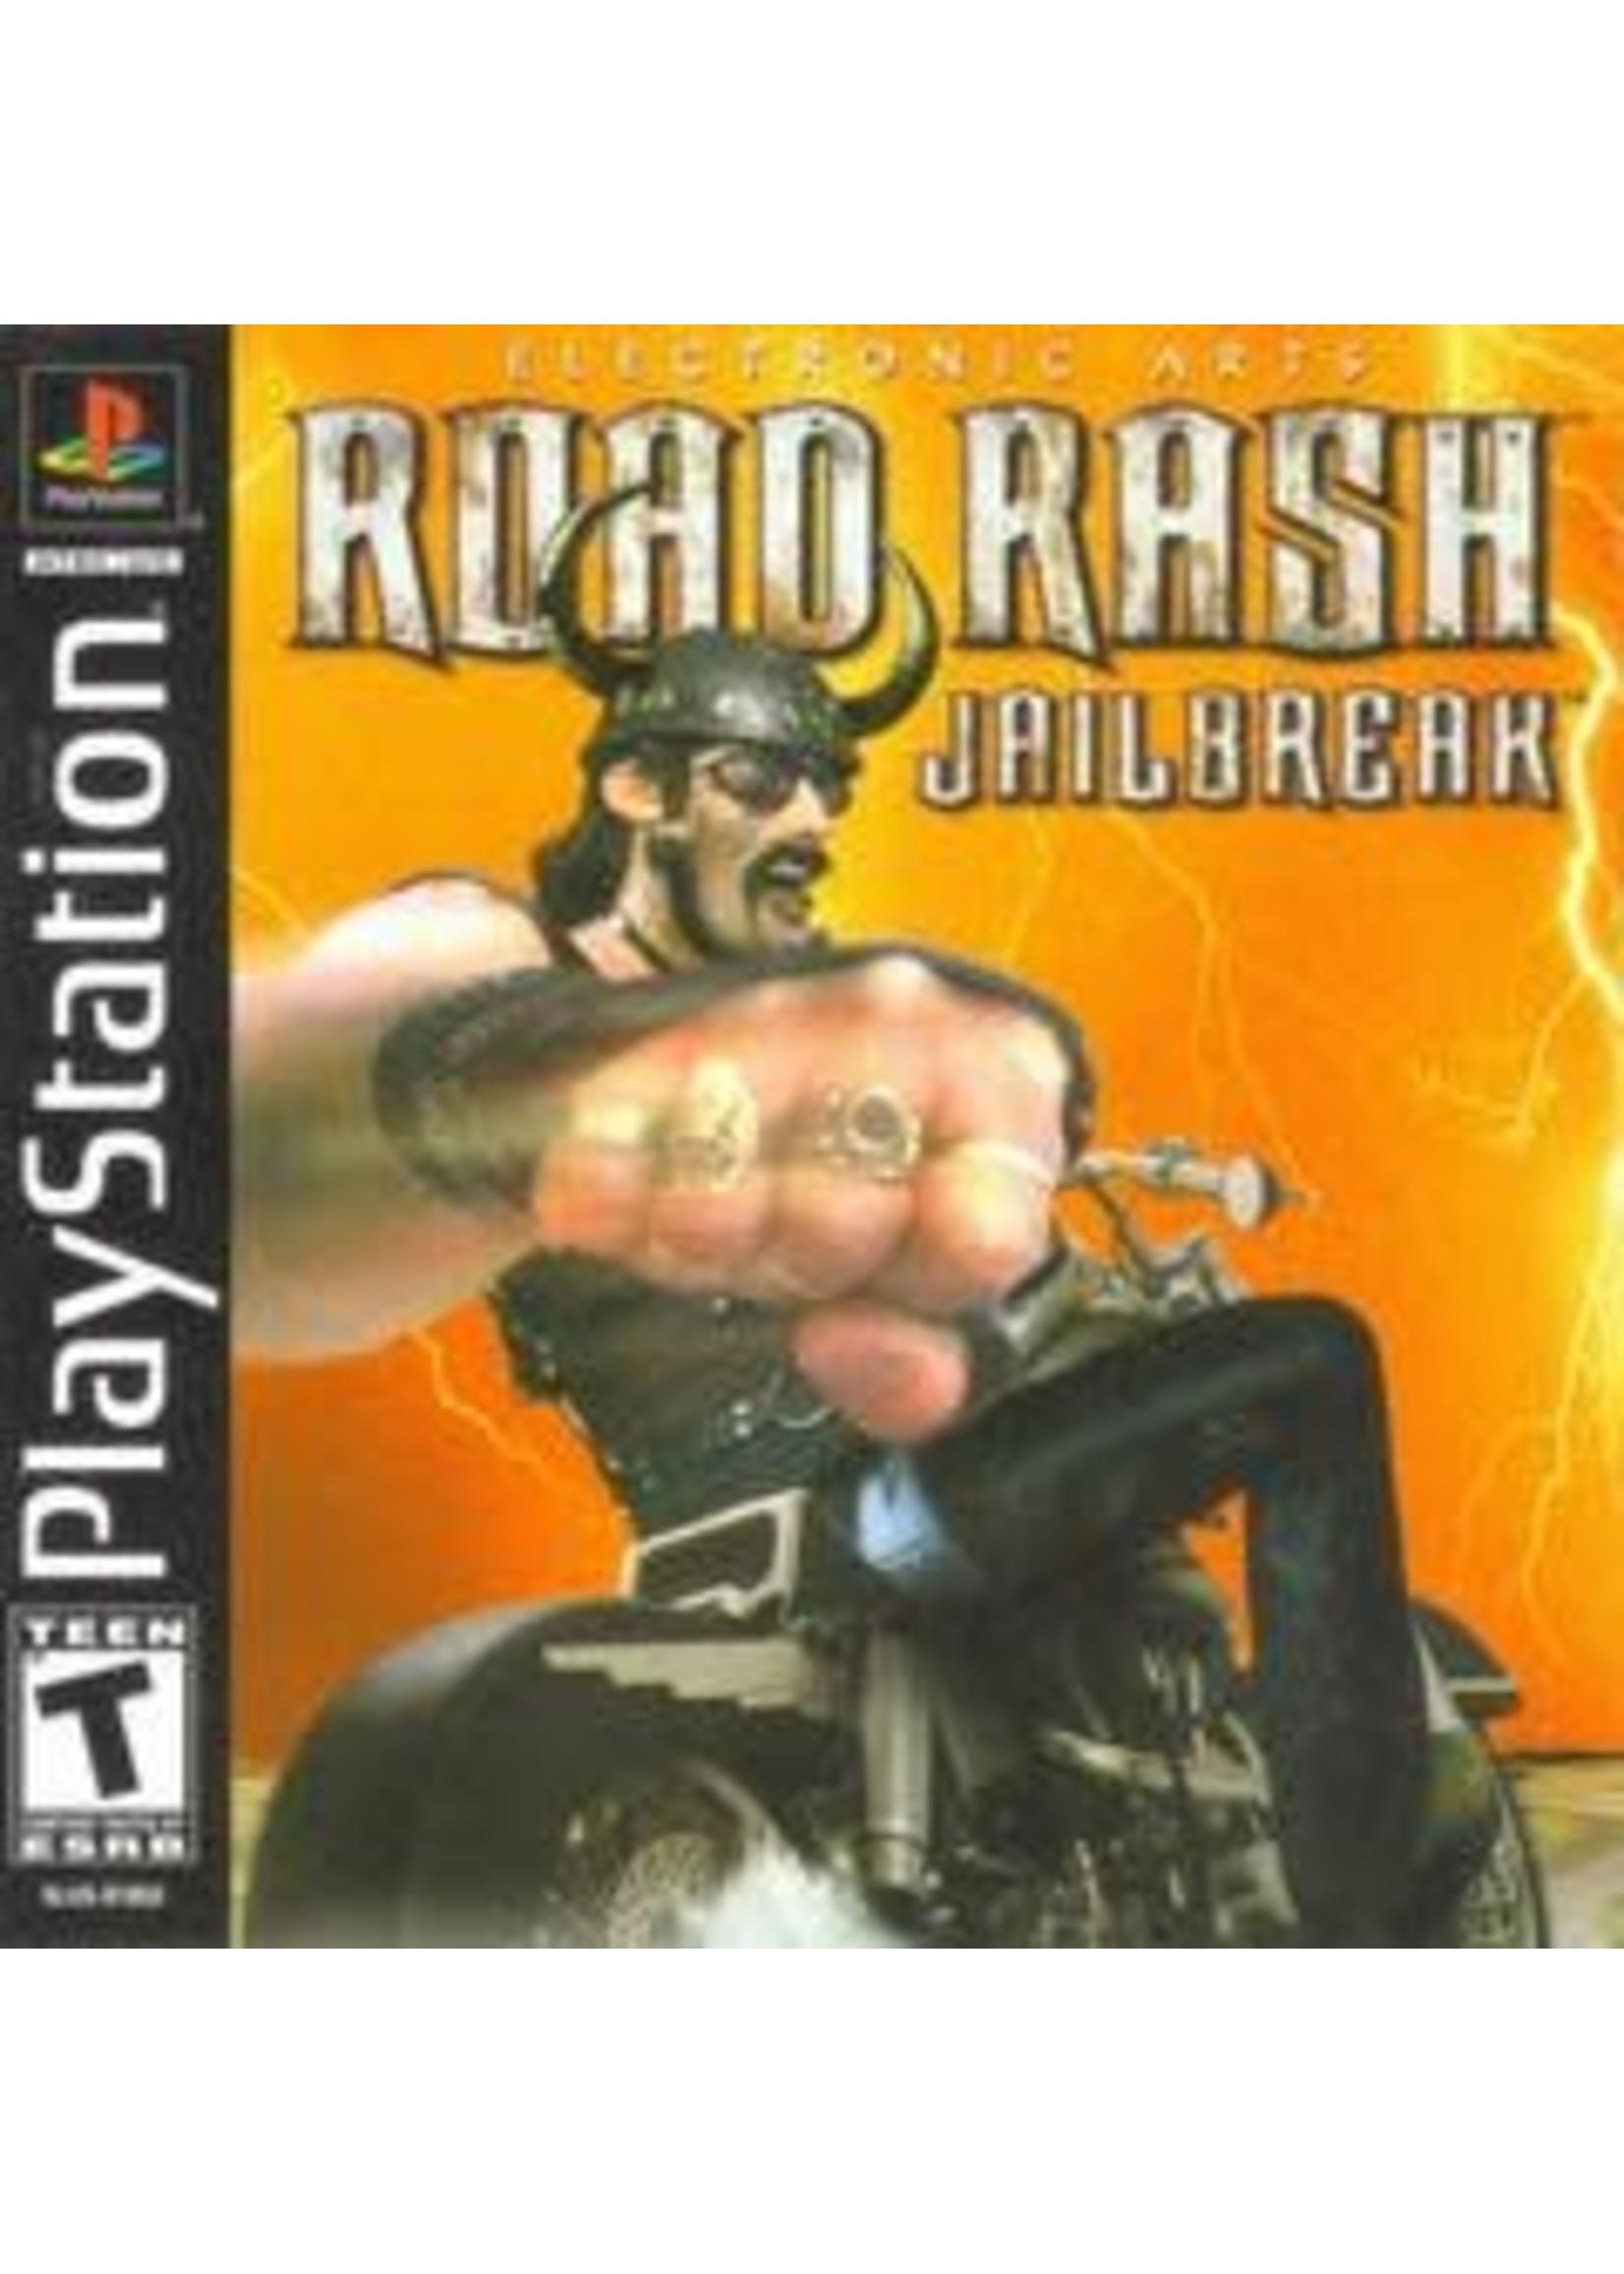 Road Rash Jailbreak Playstation